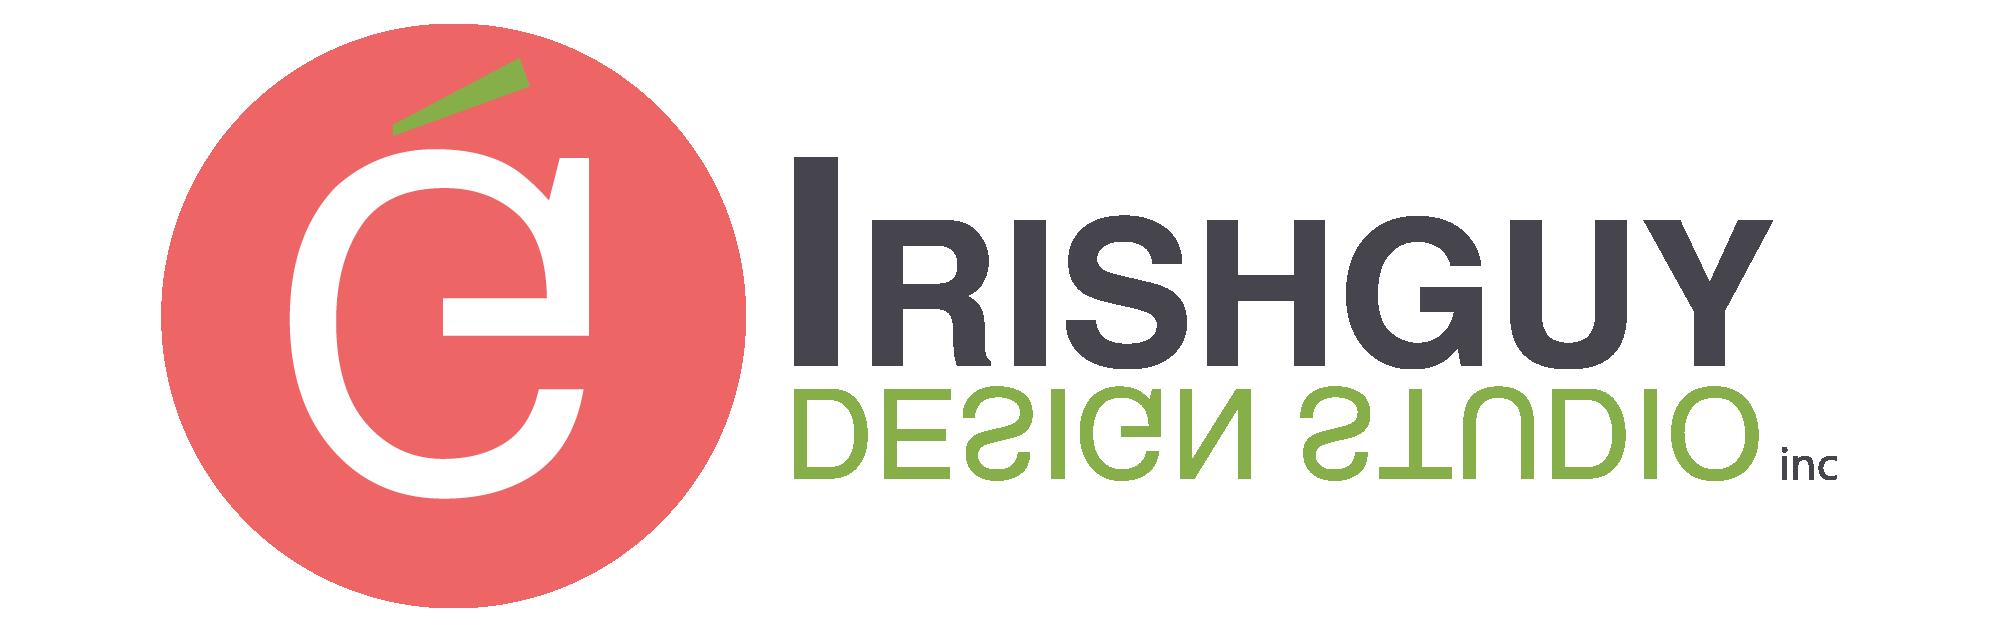 IRISHGUY Design Studio